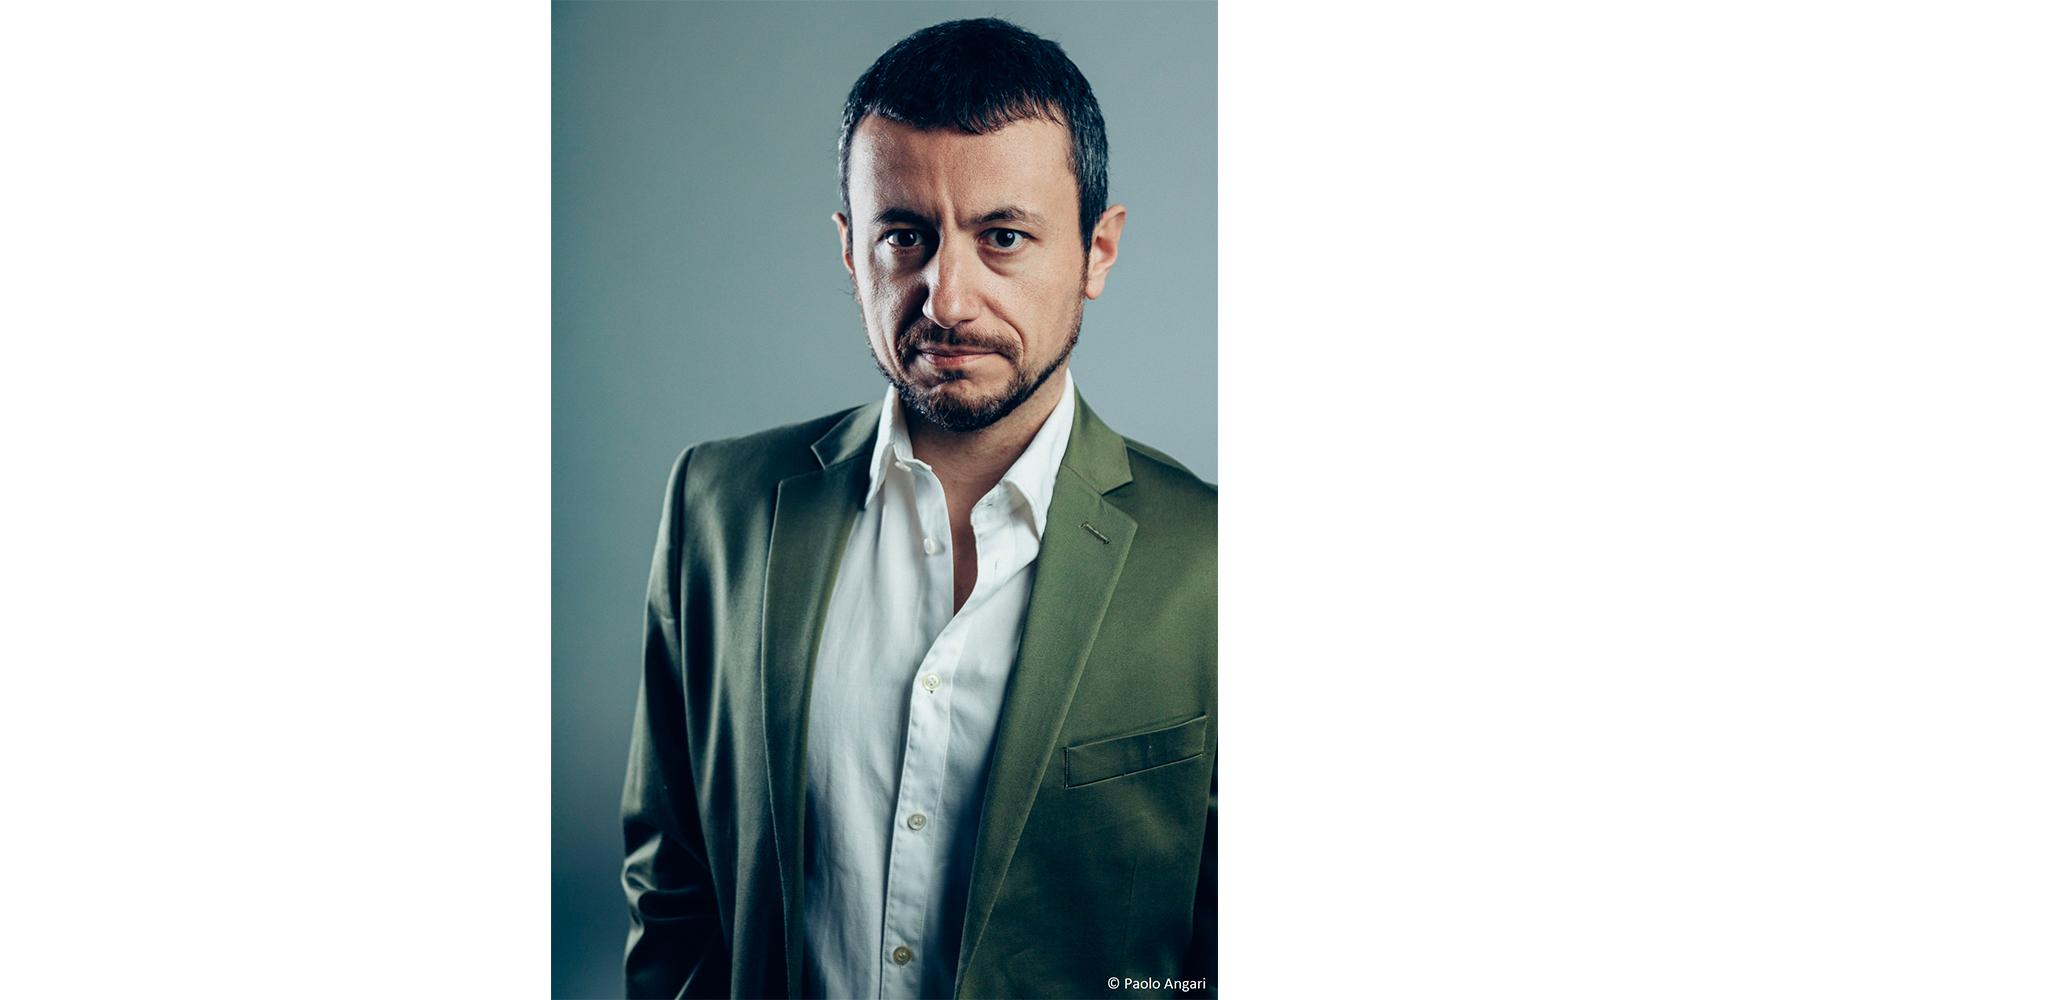 Photo Francesco